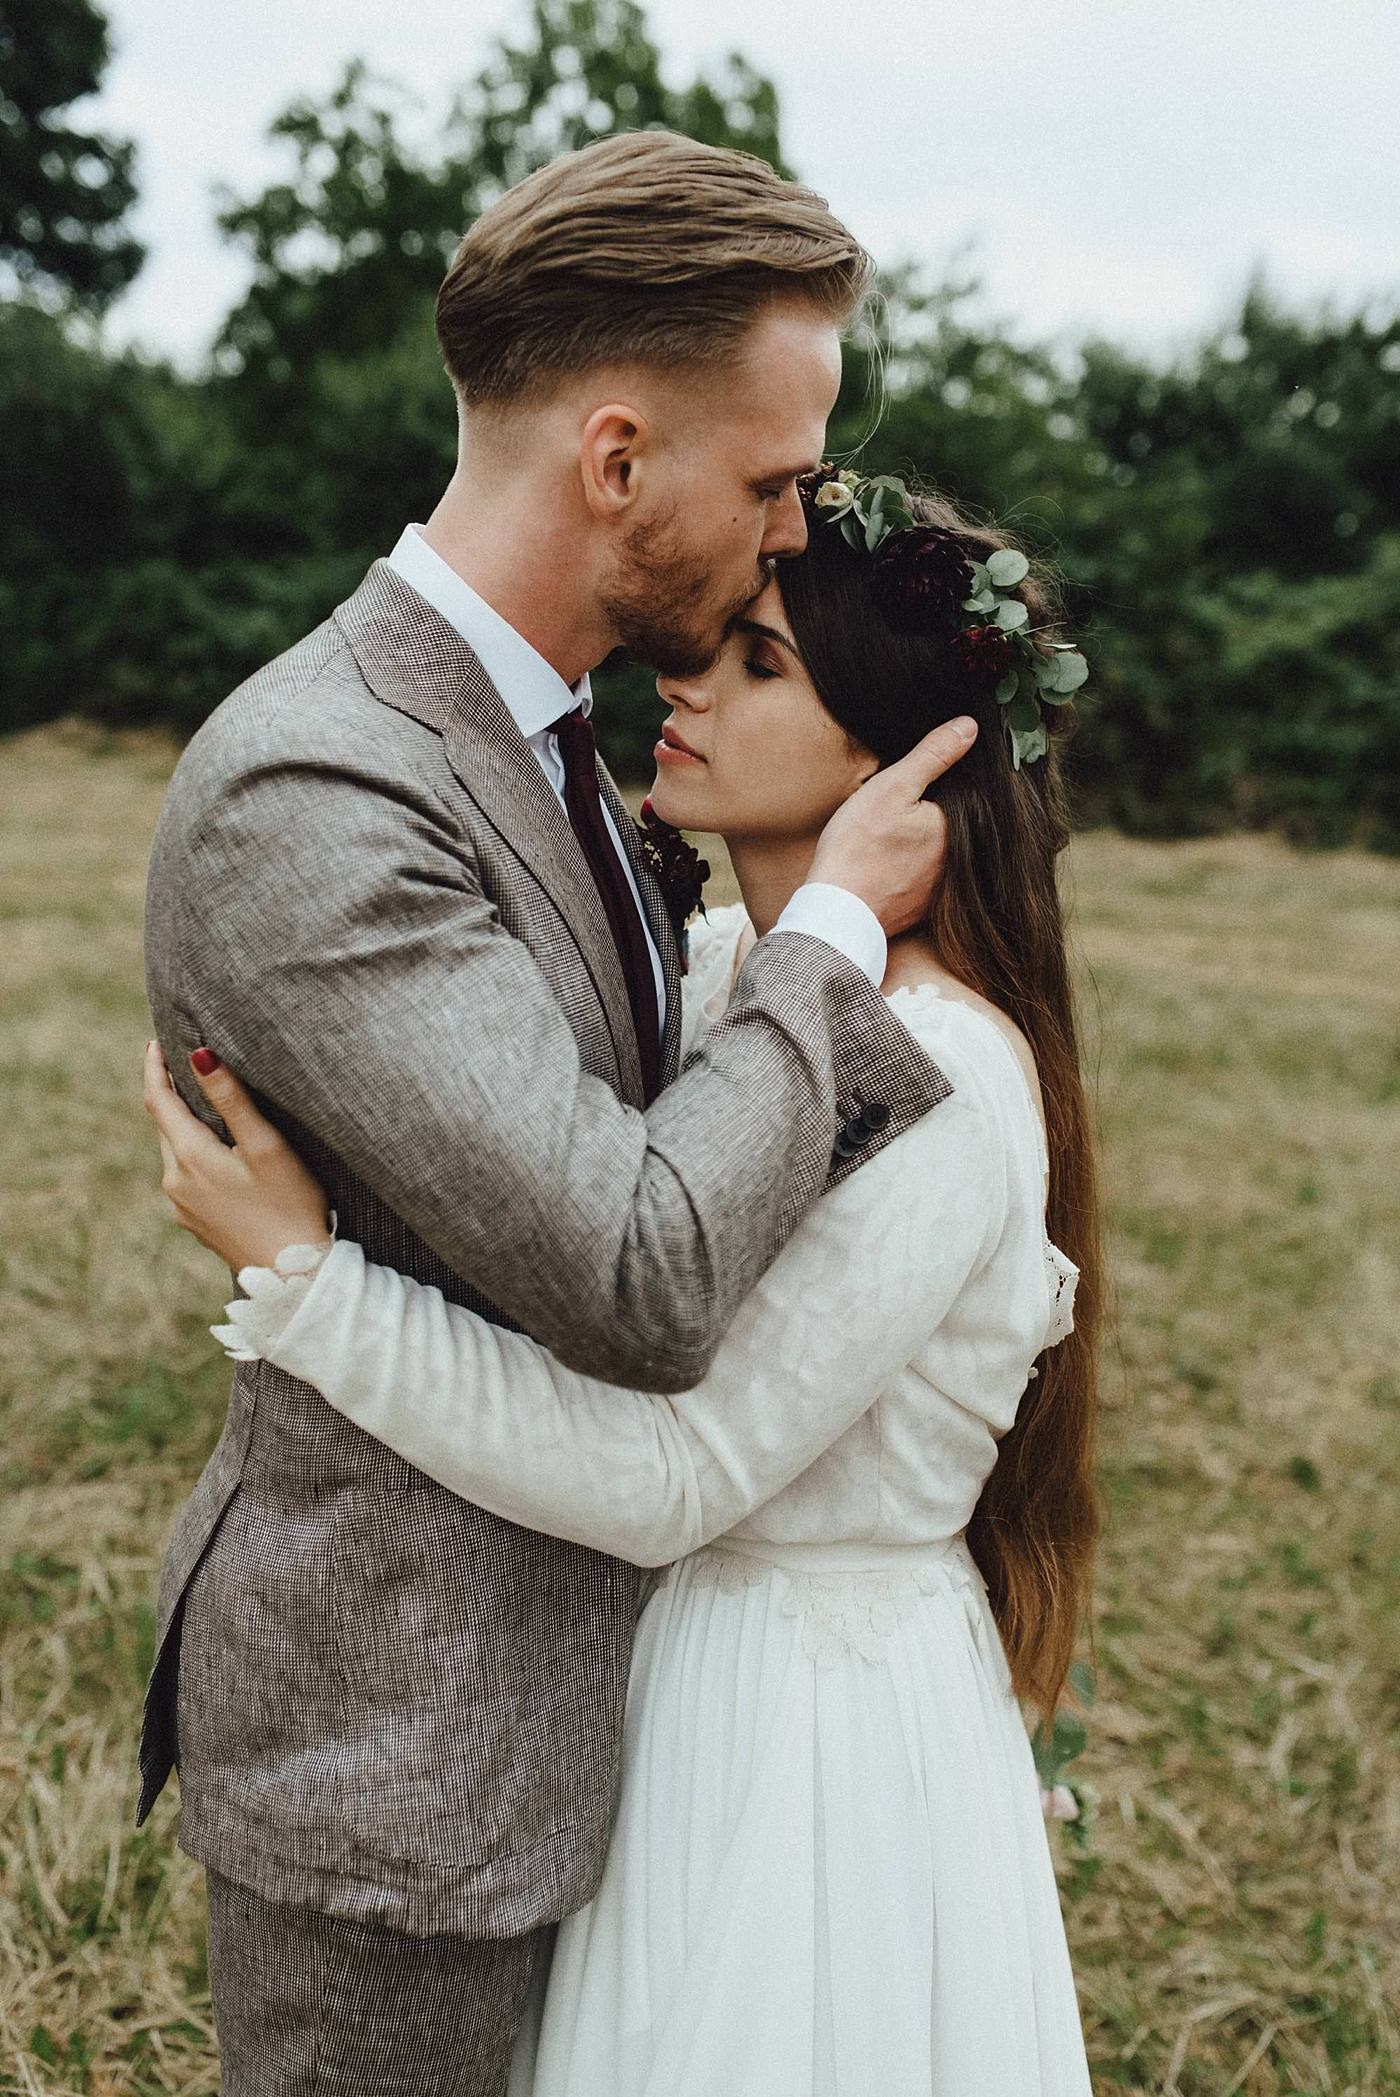 urban-elopement-wedding-219